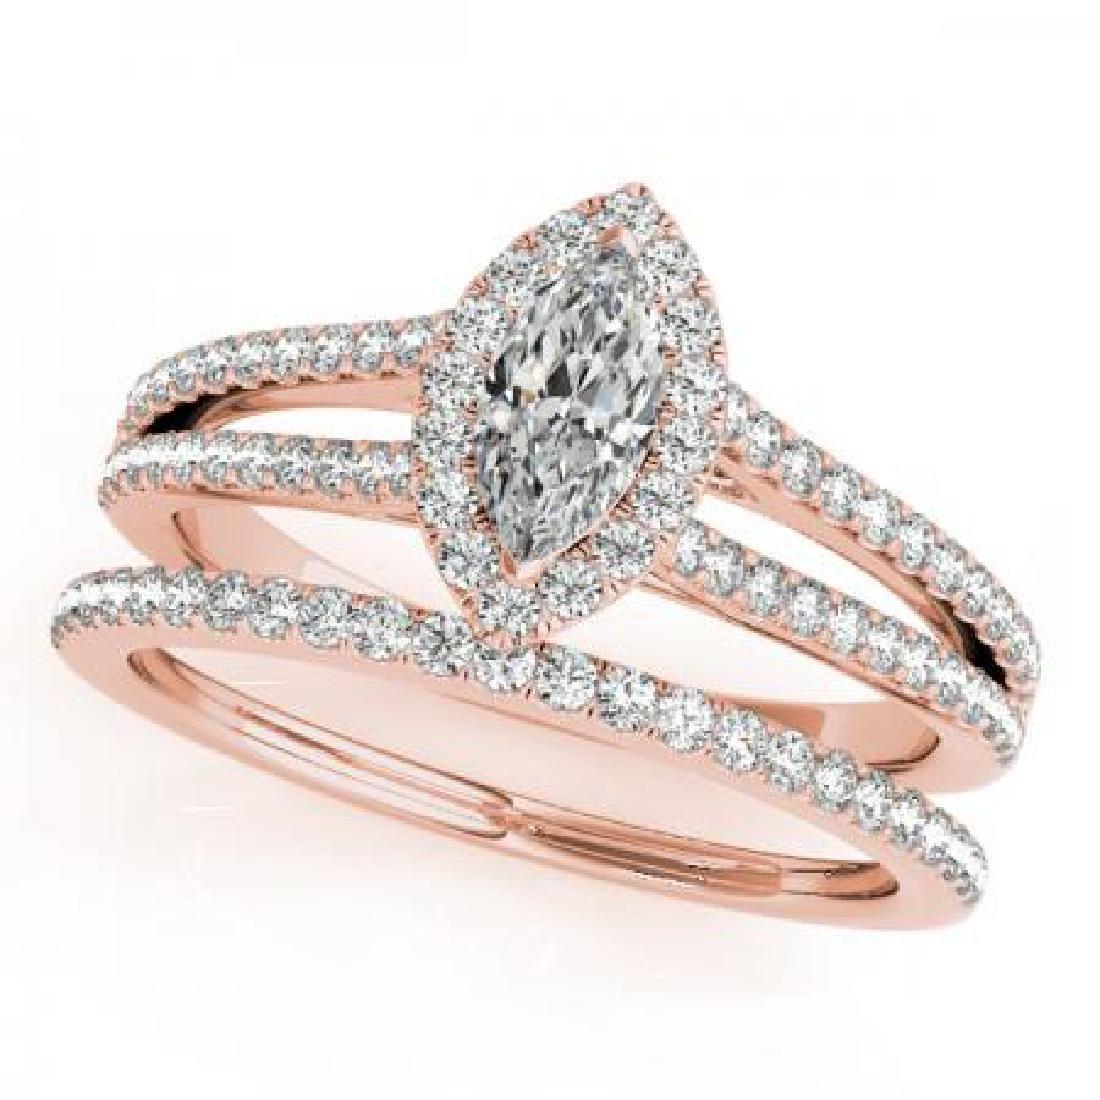 CERTIFIED 14KT ROSE GOLD 1.00 CT G-H/VS-SI1 DIAMOND HAL